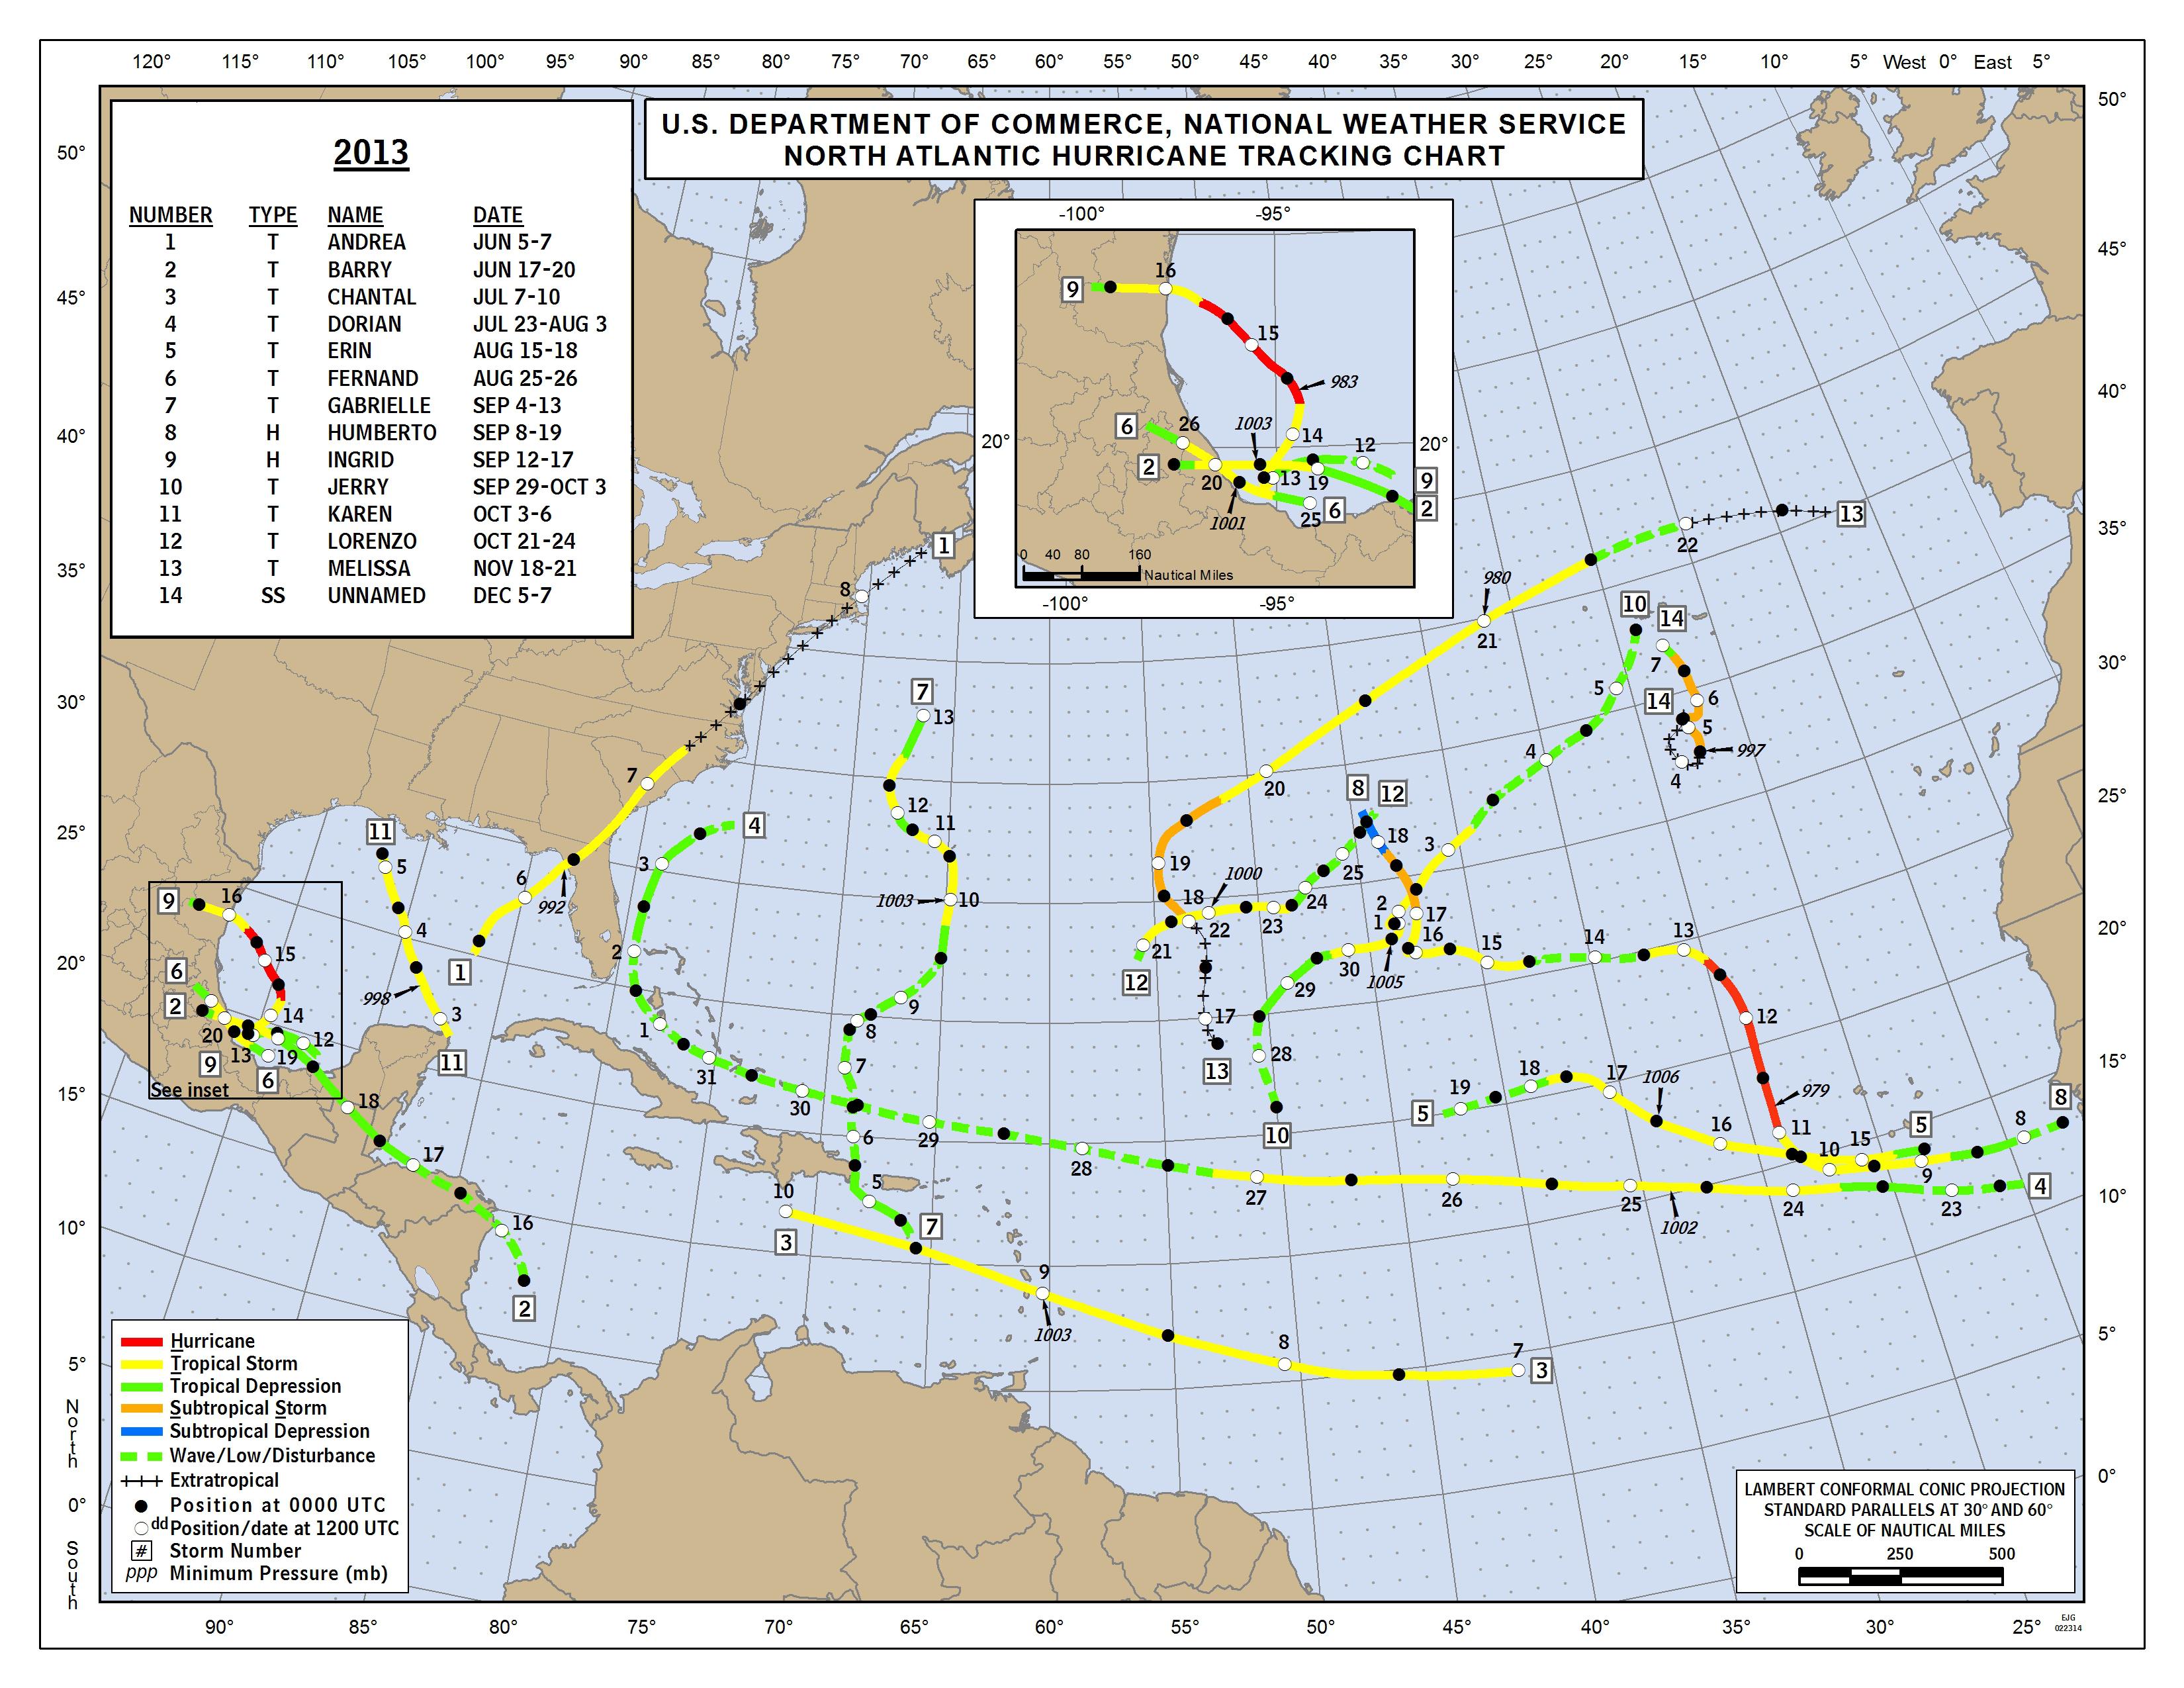 2007 Atlantic Hurricane Season  |Atlantic Hurricane Tracking Map